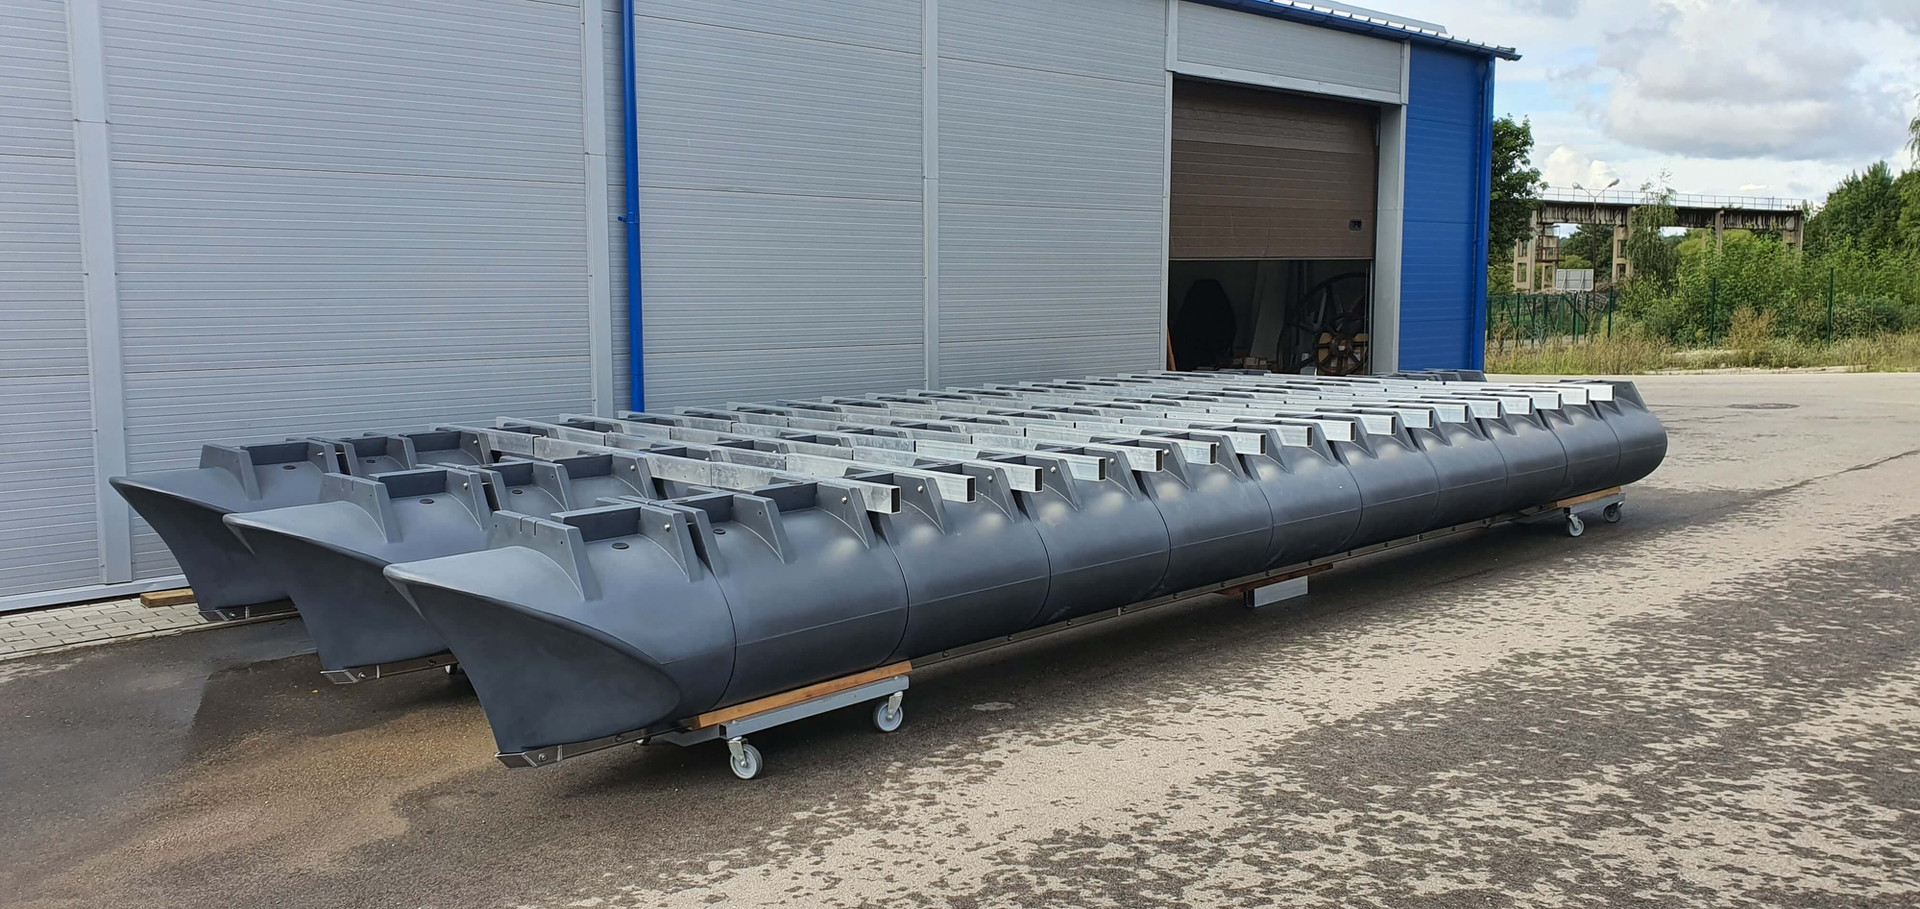 10m x 4m splitable trimaran